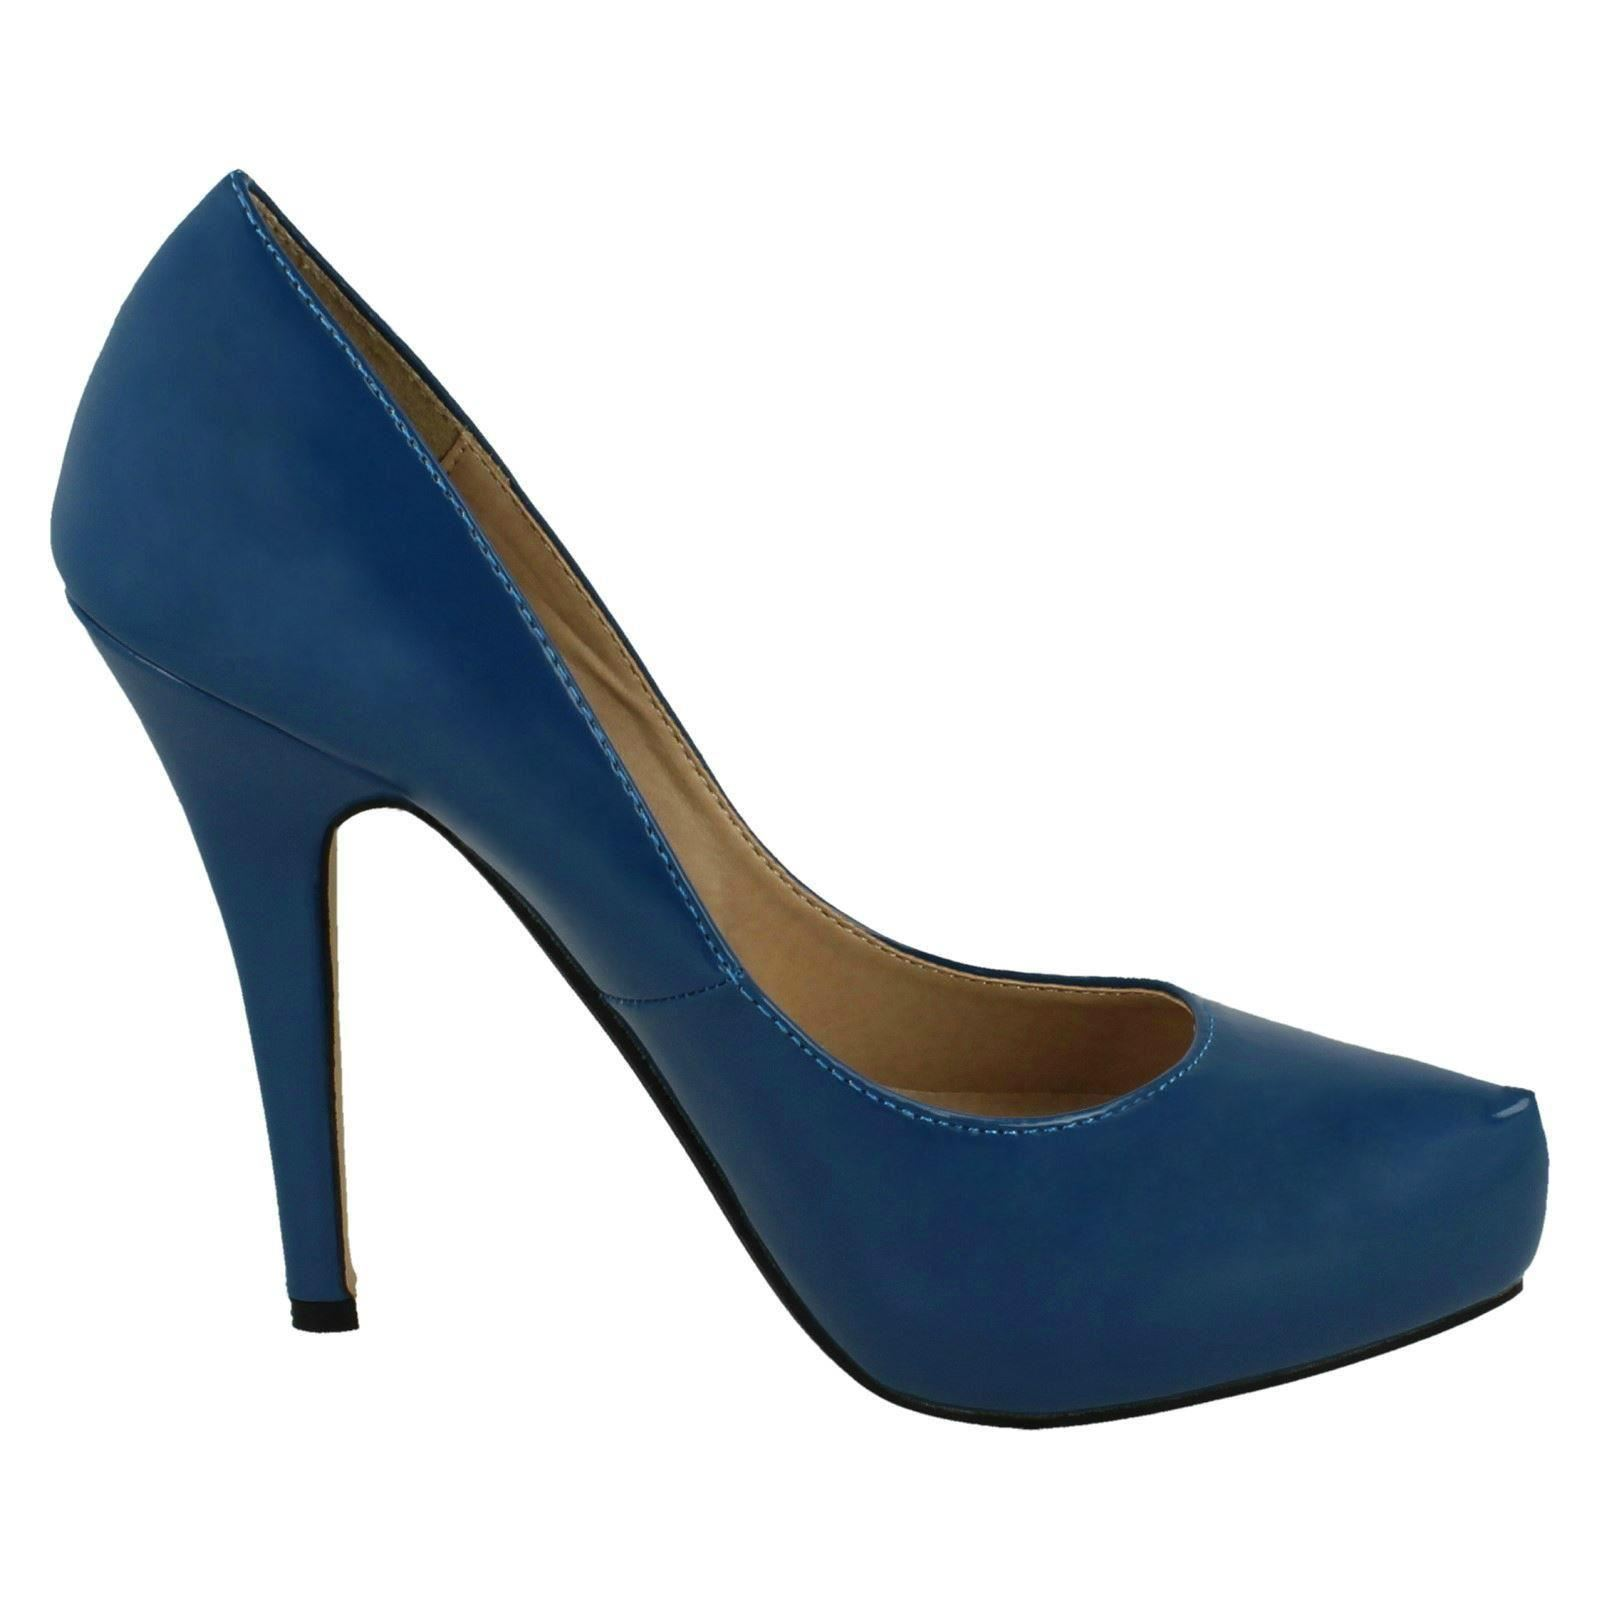 Damas Anne Michelle Zapatos informales Tribunal de Patentes F9775 estilo ~ K